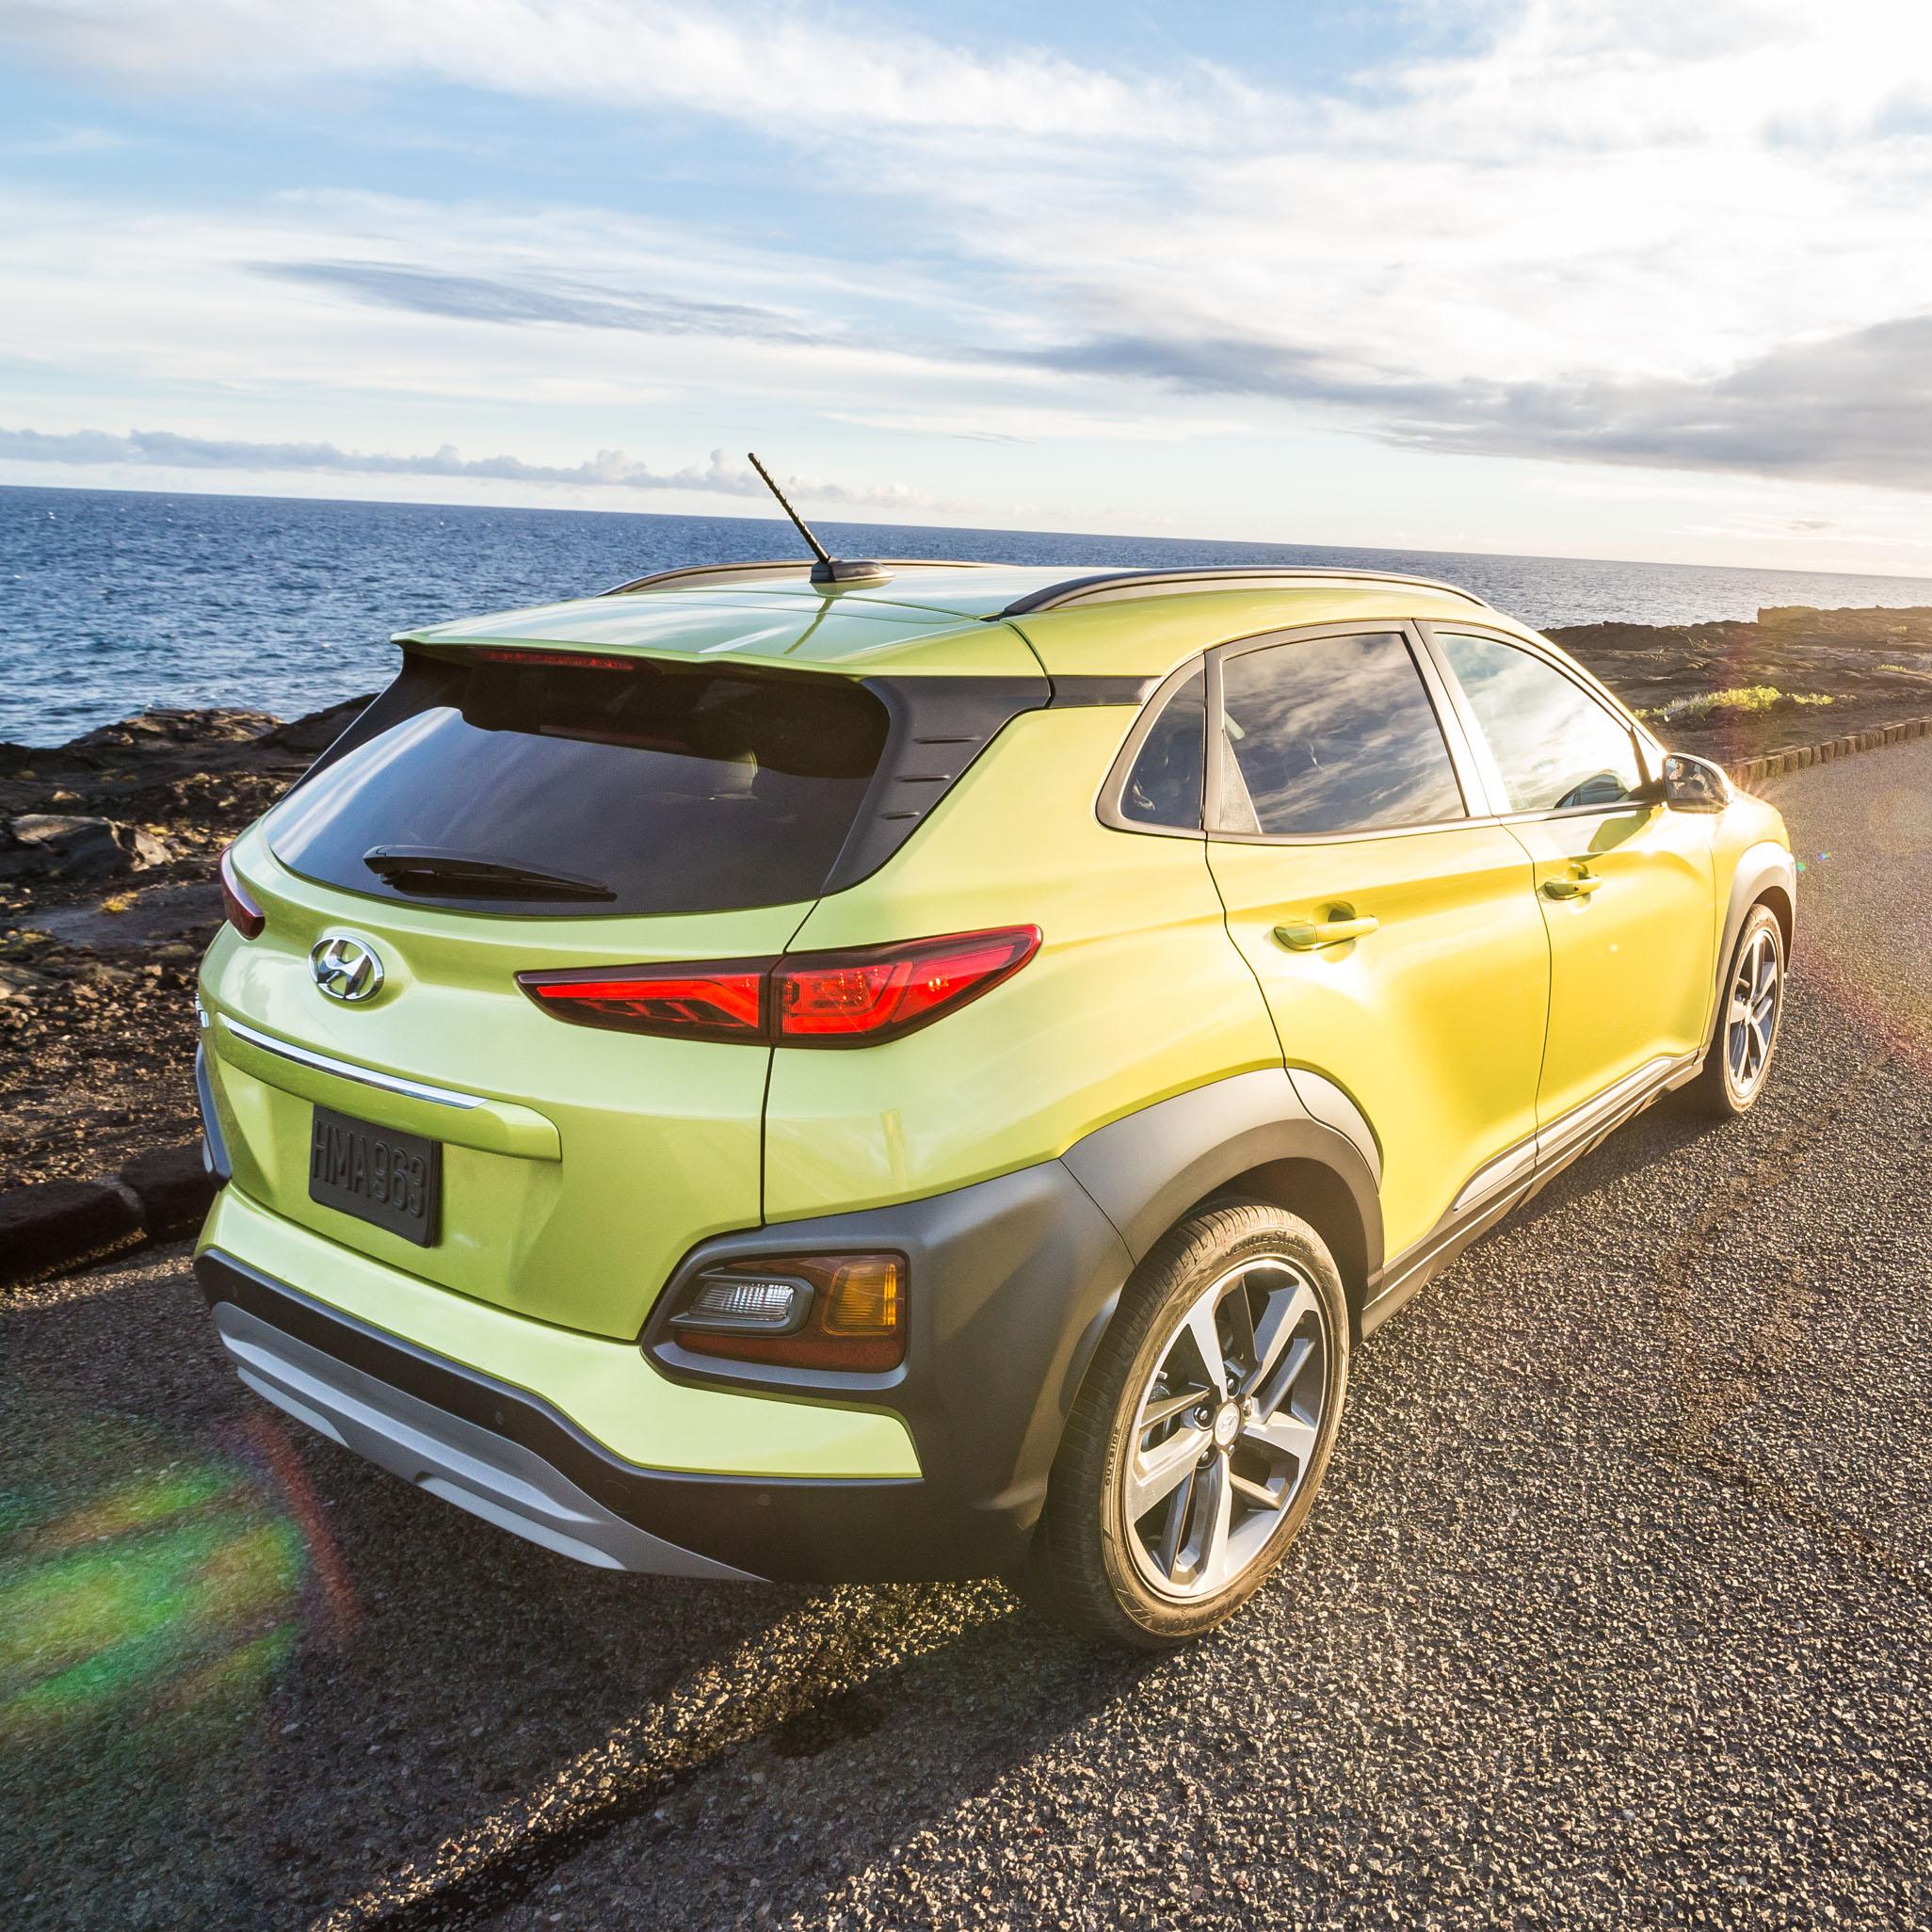 2020 Hyundai Kona Awd Release Date Colors Hybrid